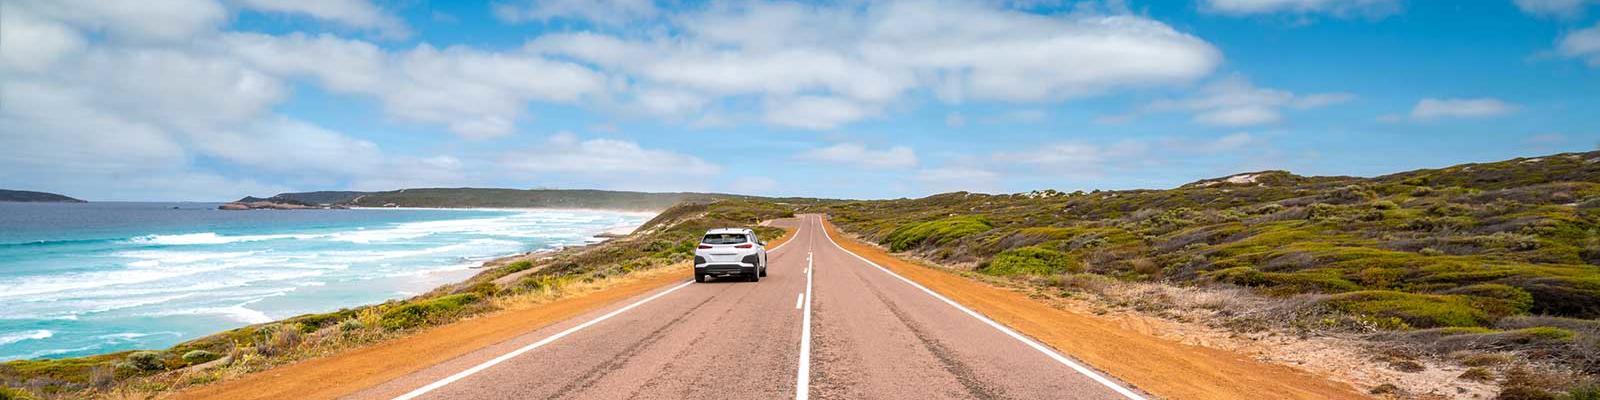 road trip australia coastling